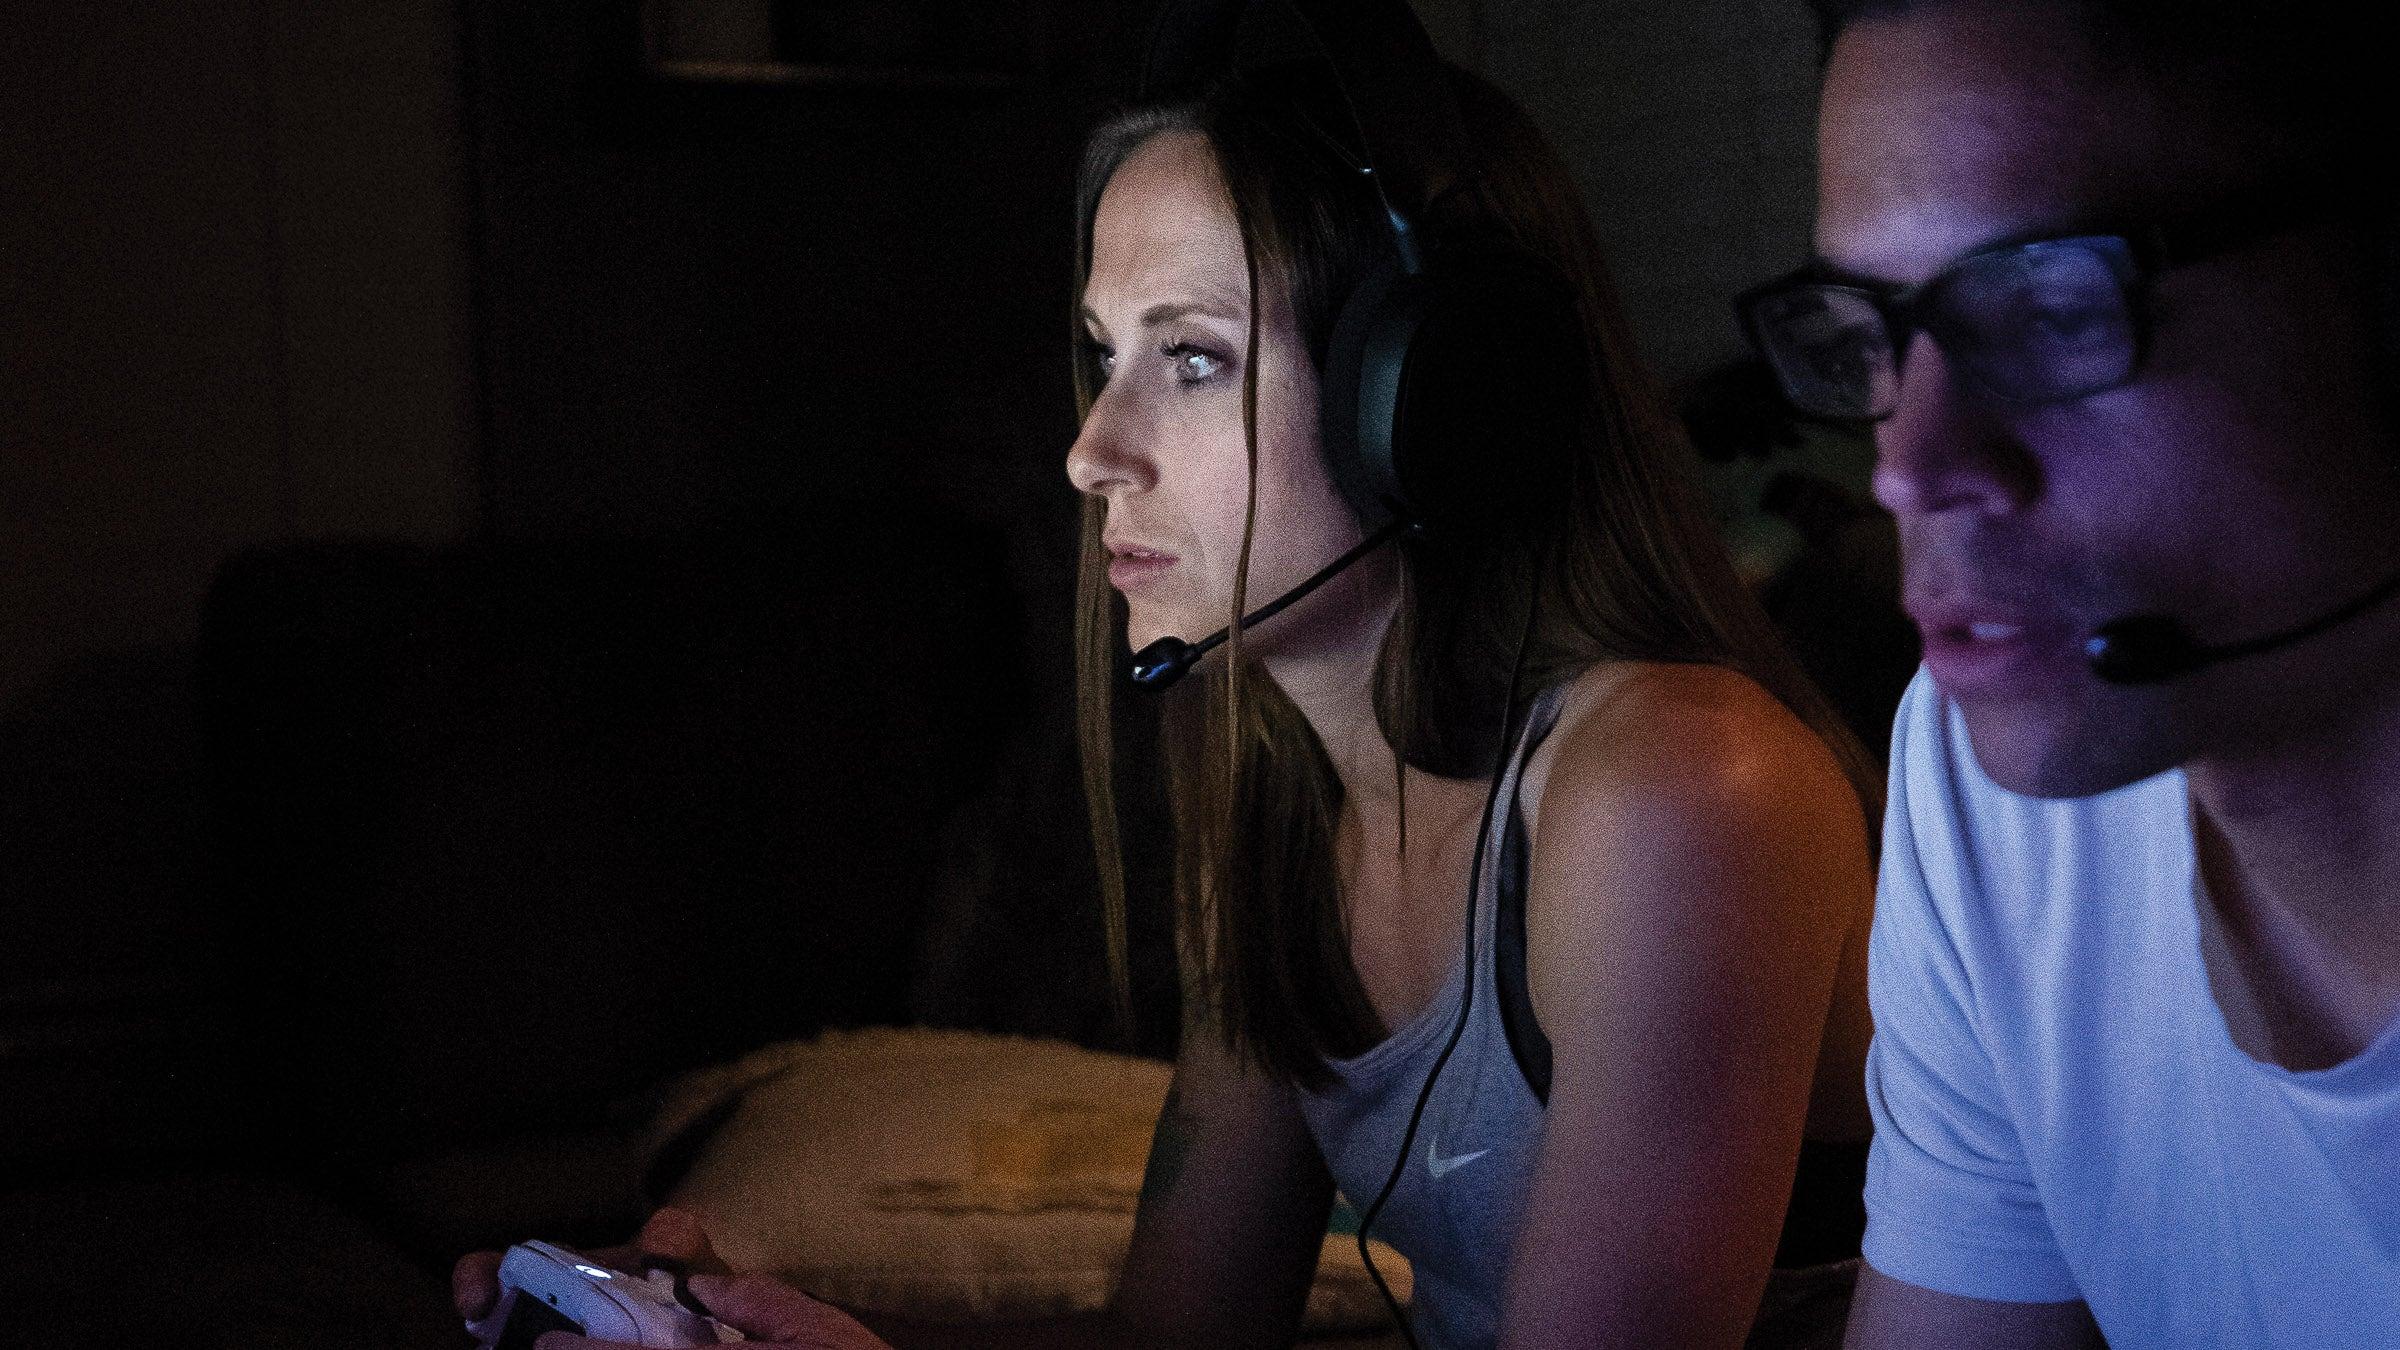 Shelby Houlihan late night gaming